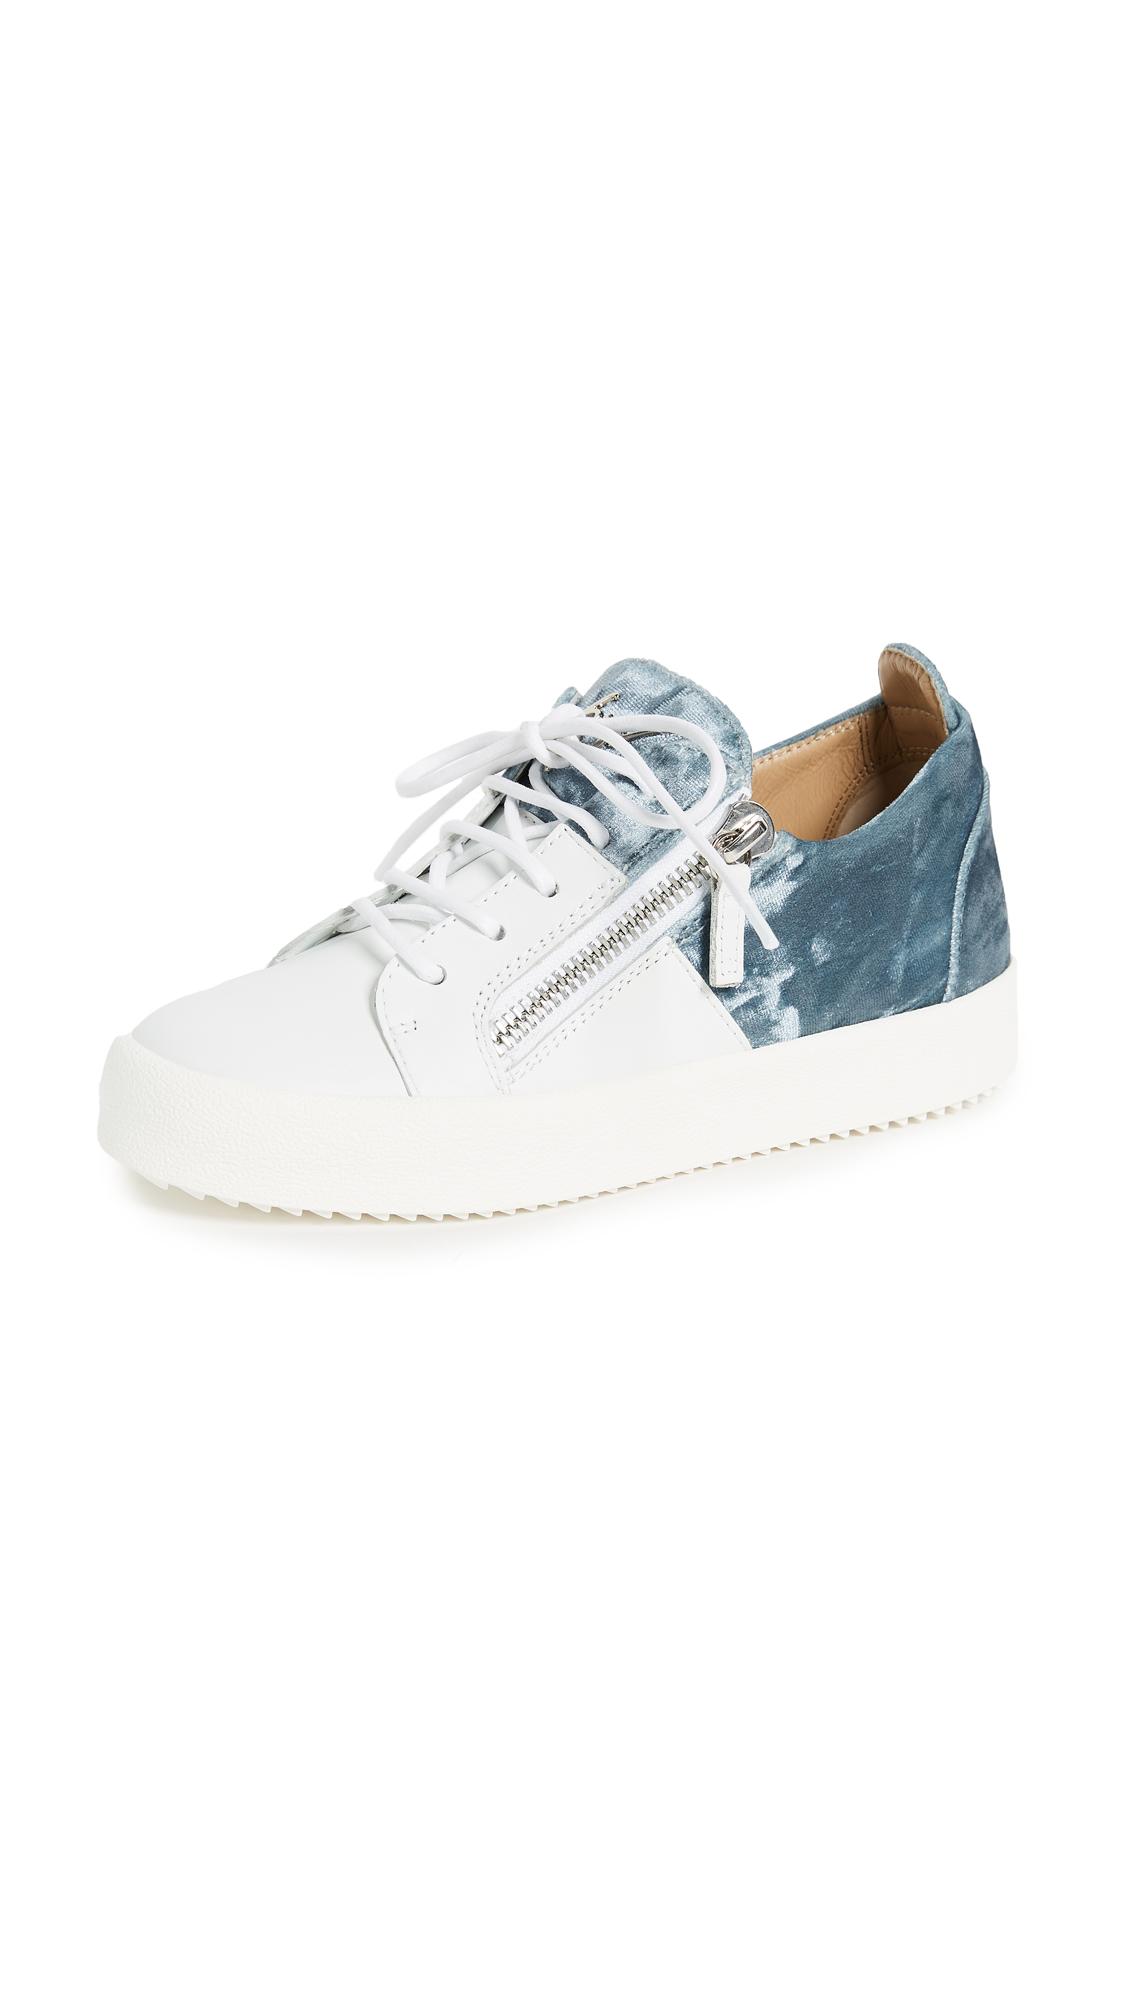 Giuseppe Zanotti Zip Sneakers - Bianco